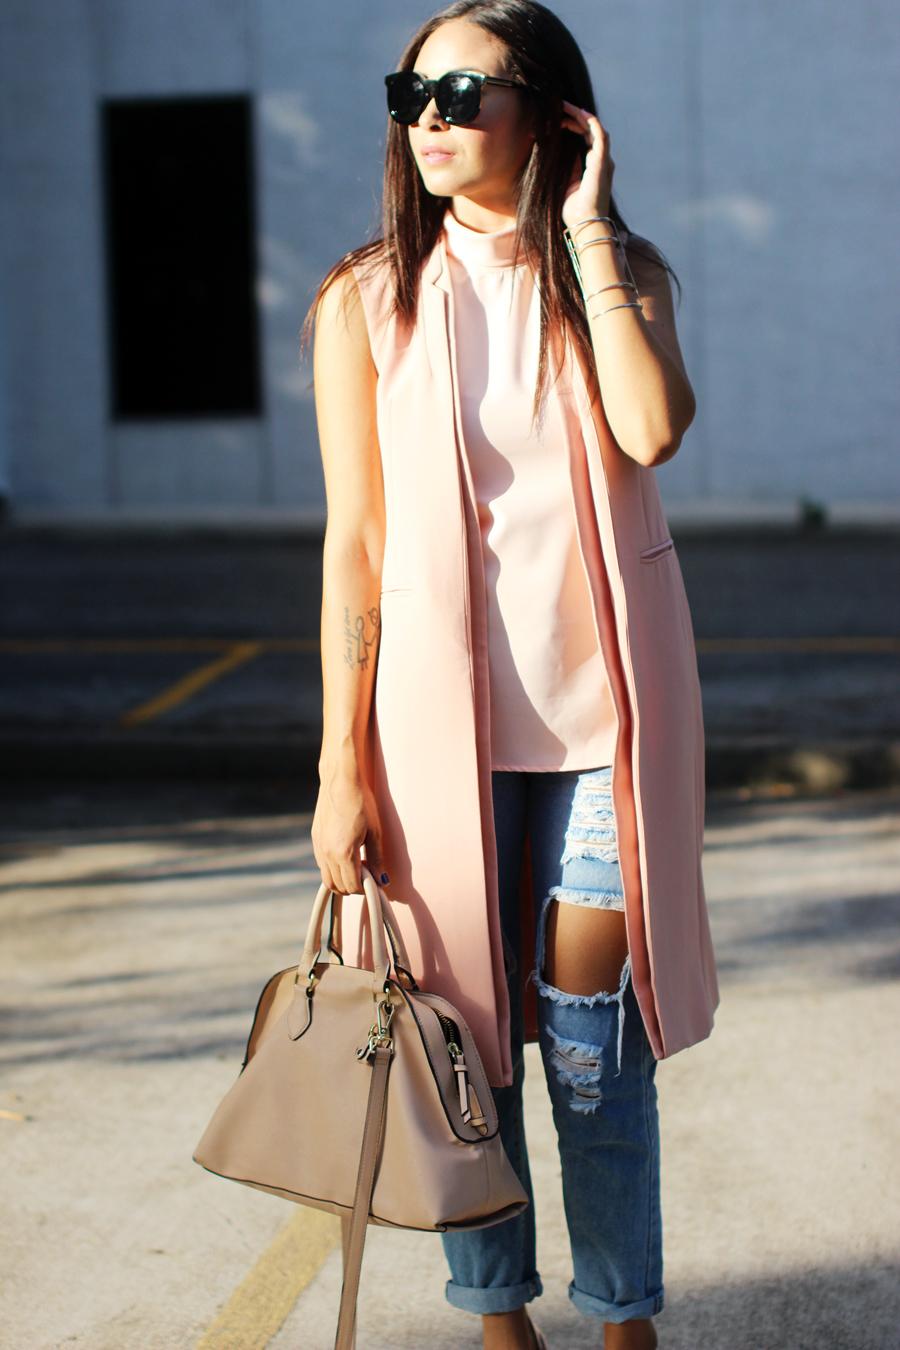 ftt-pink-vest-ripped-jeans-halter-3